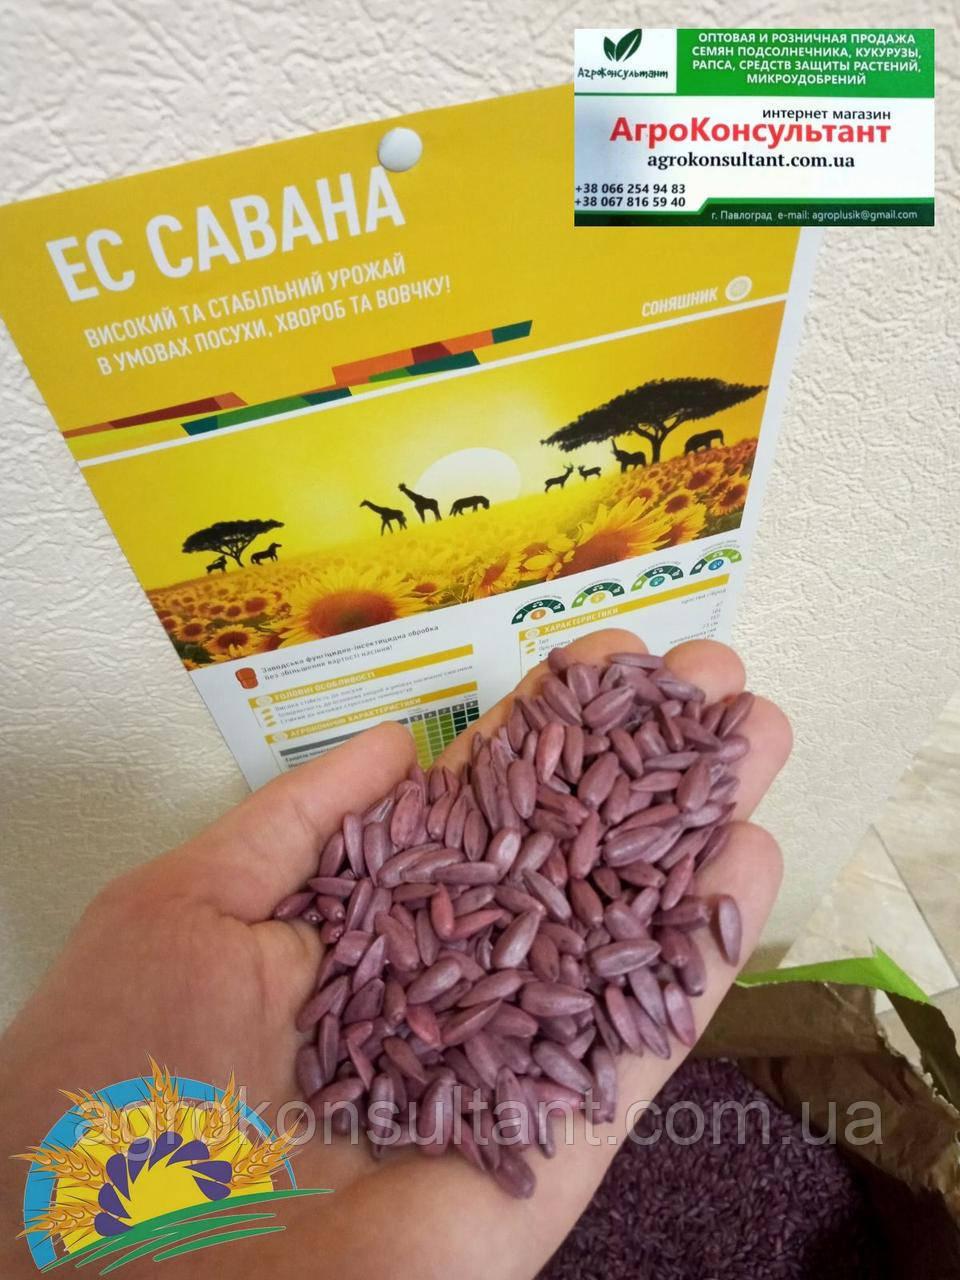 ЕС Савана (урожай 2020 года, Украина) 12,3 кг - семена подсолнечника (150000 шт). Euralis